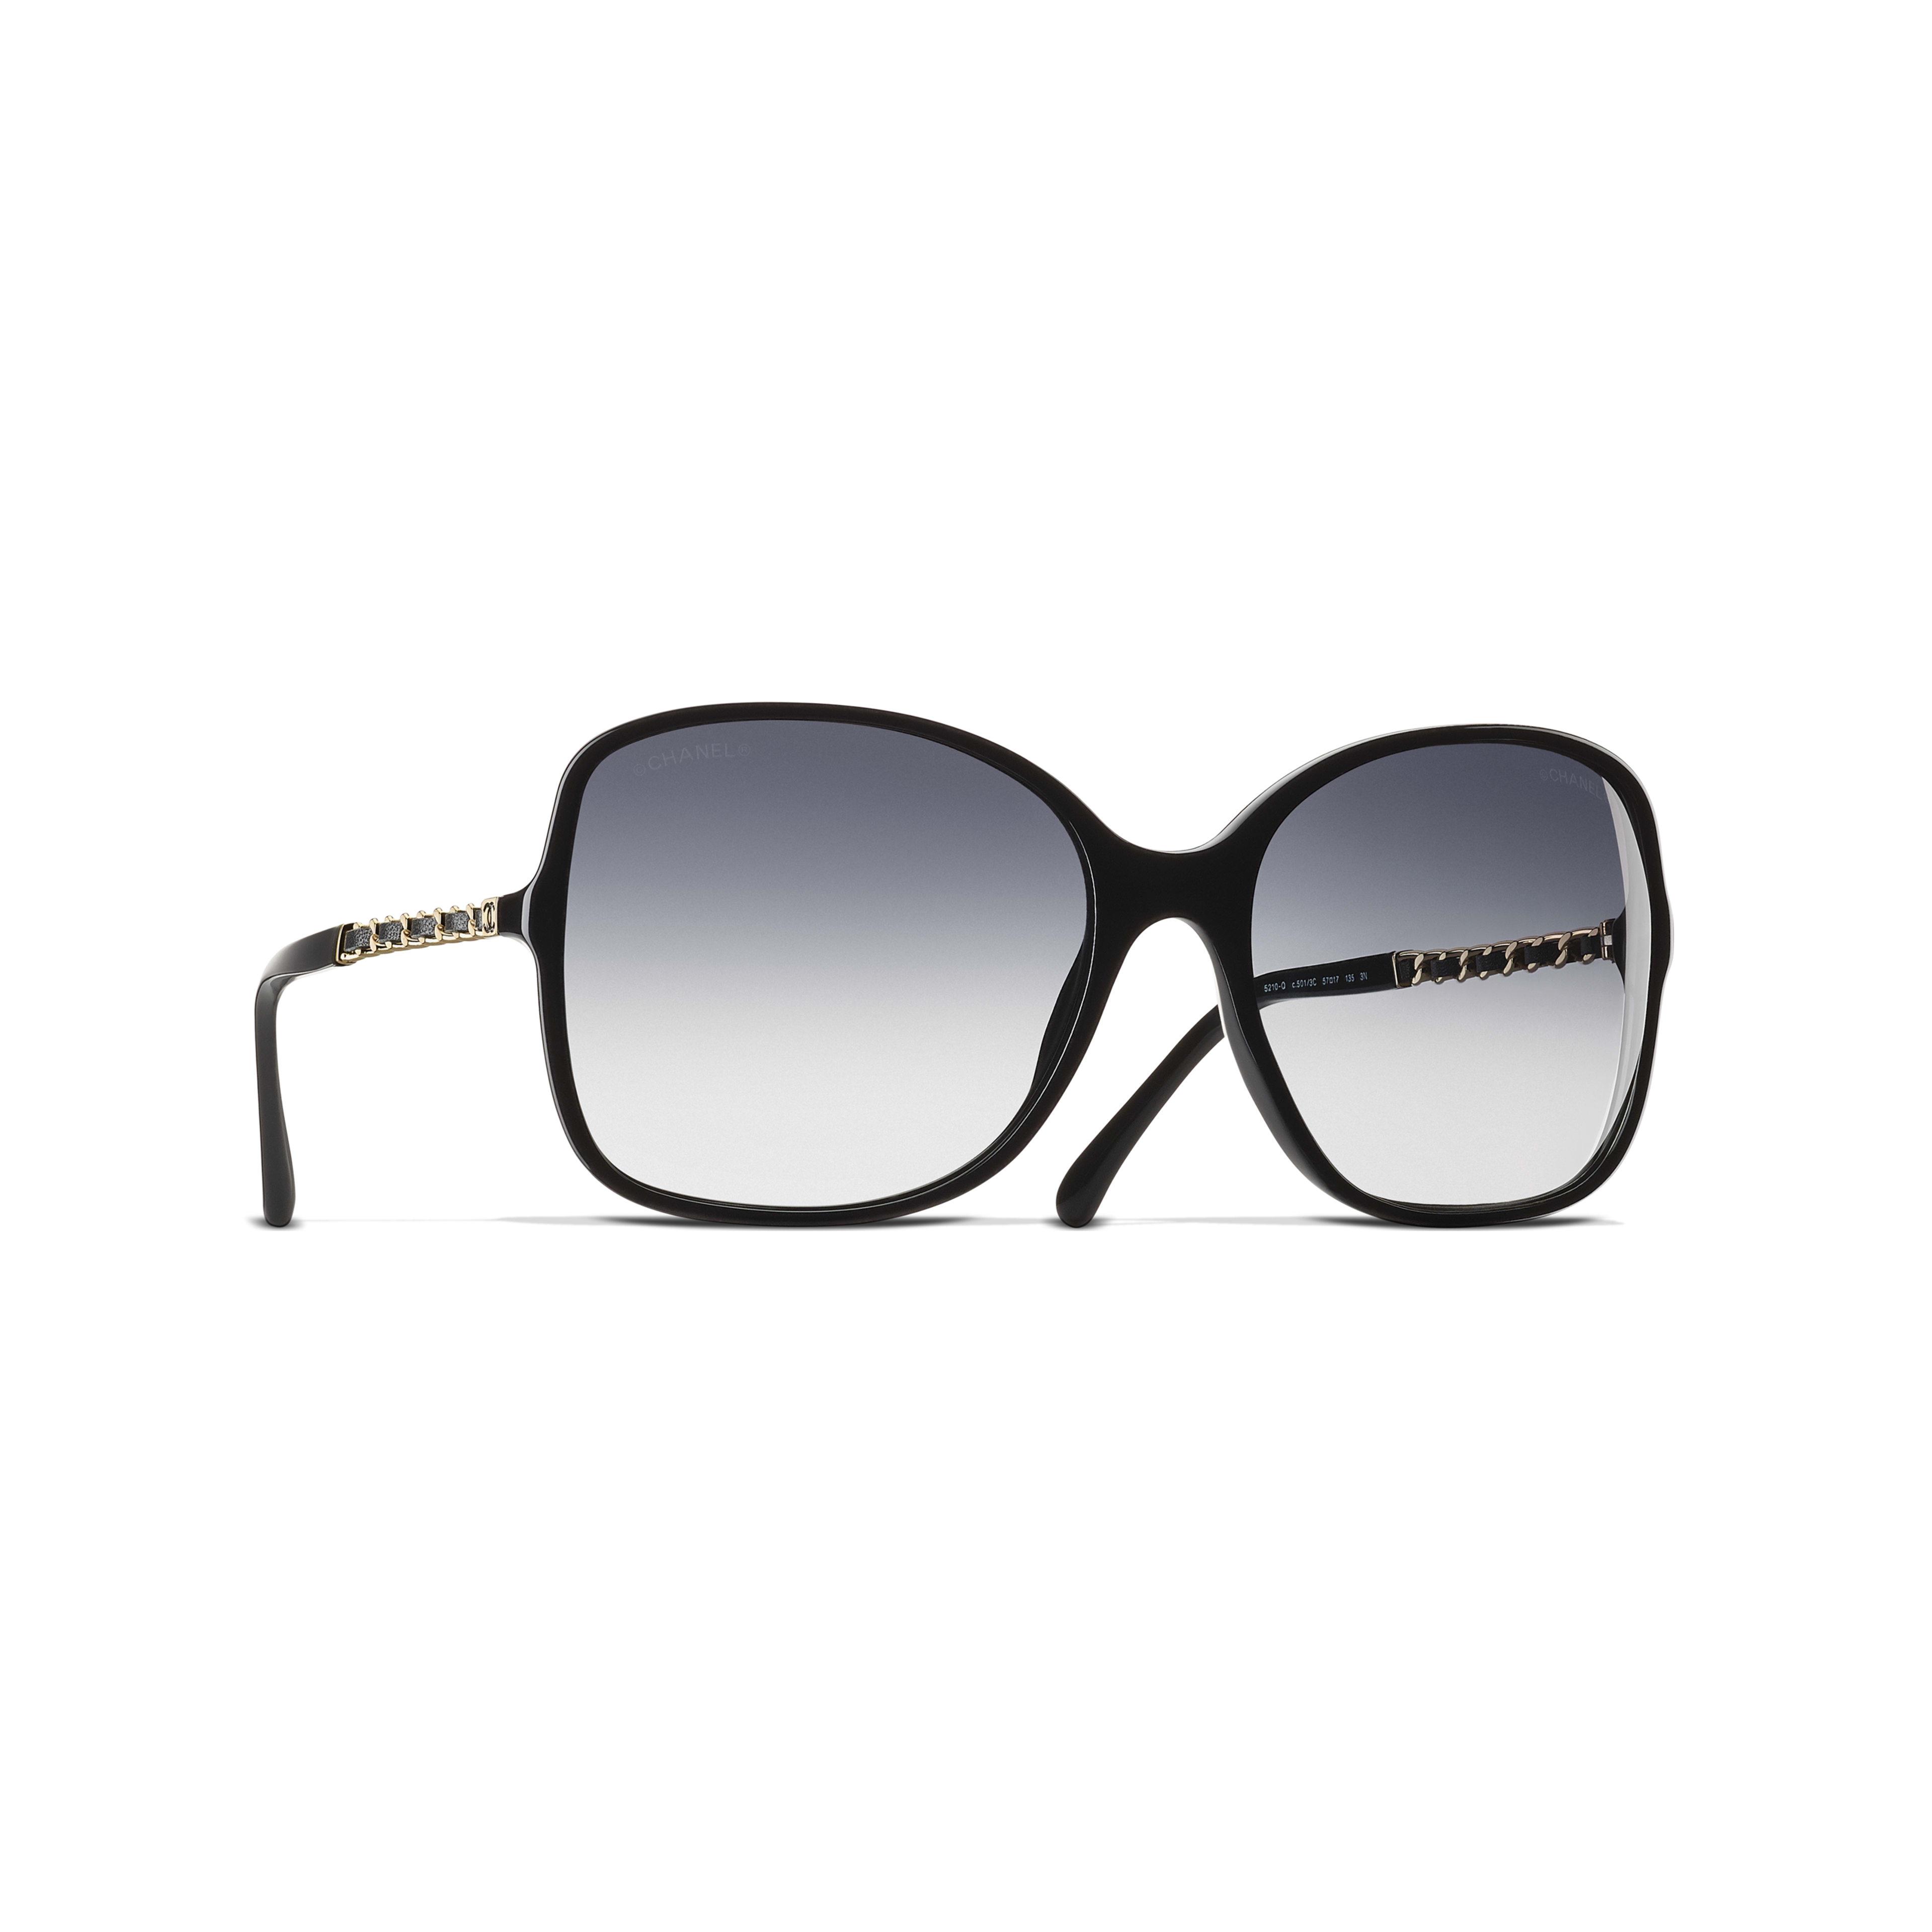 Square Sunglasses - Black - Acetate & Lambskin - Default view - see standard sized version